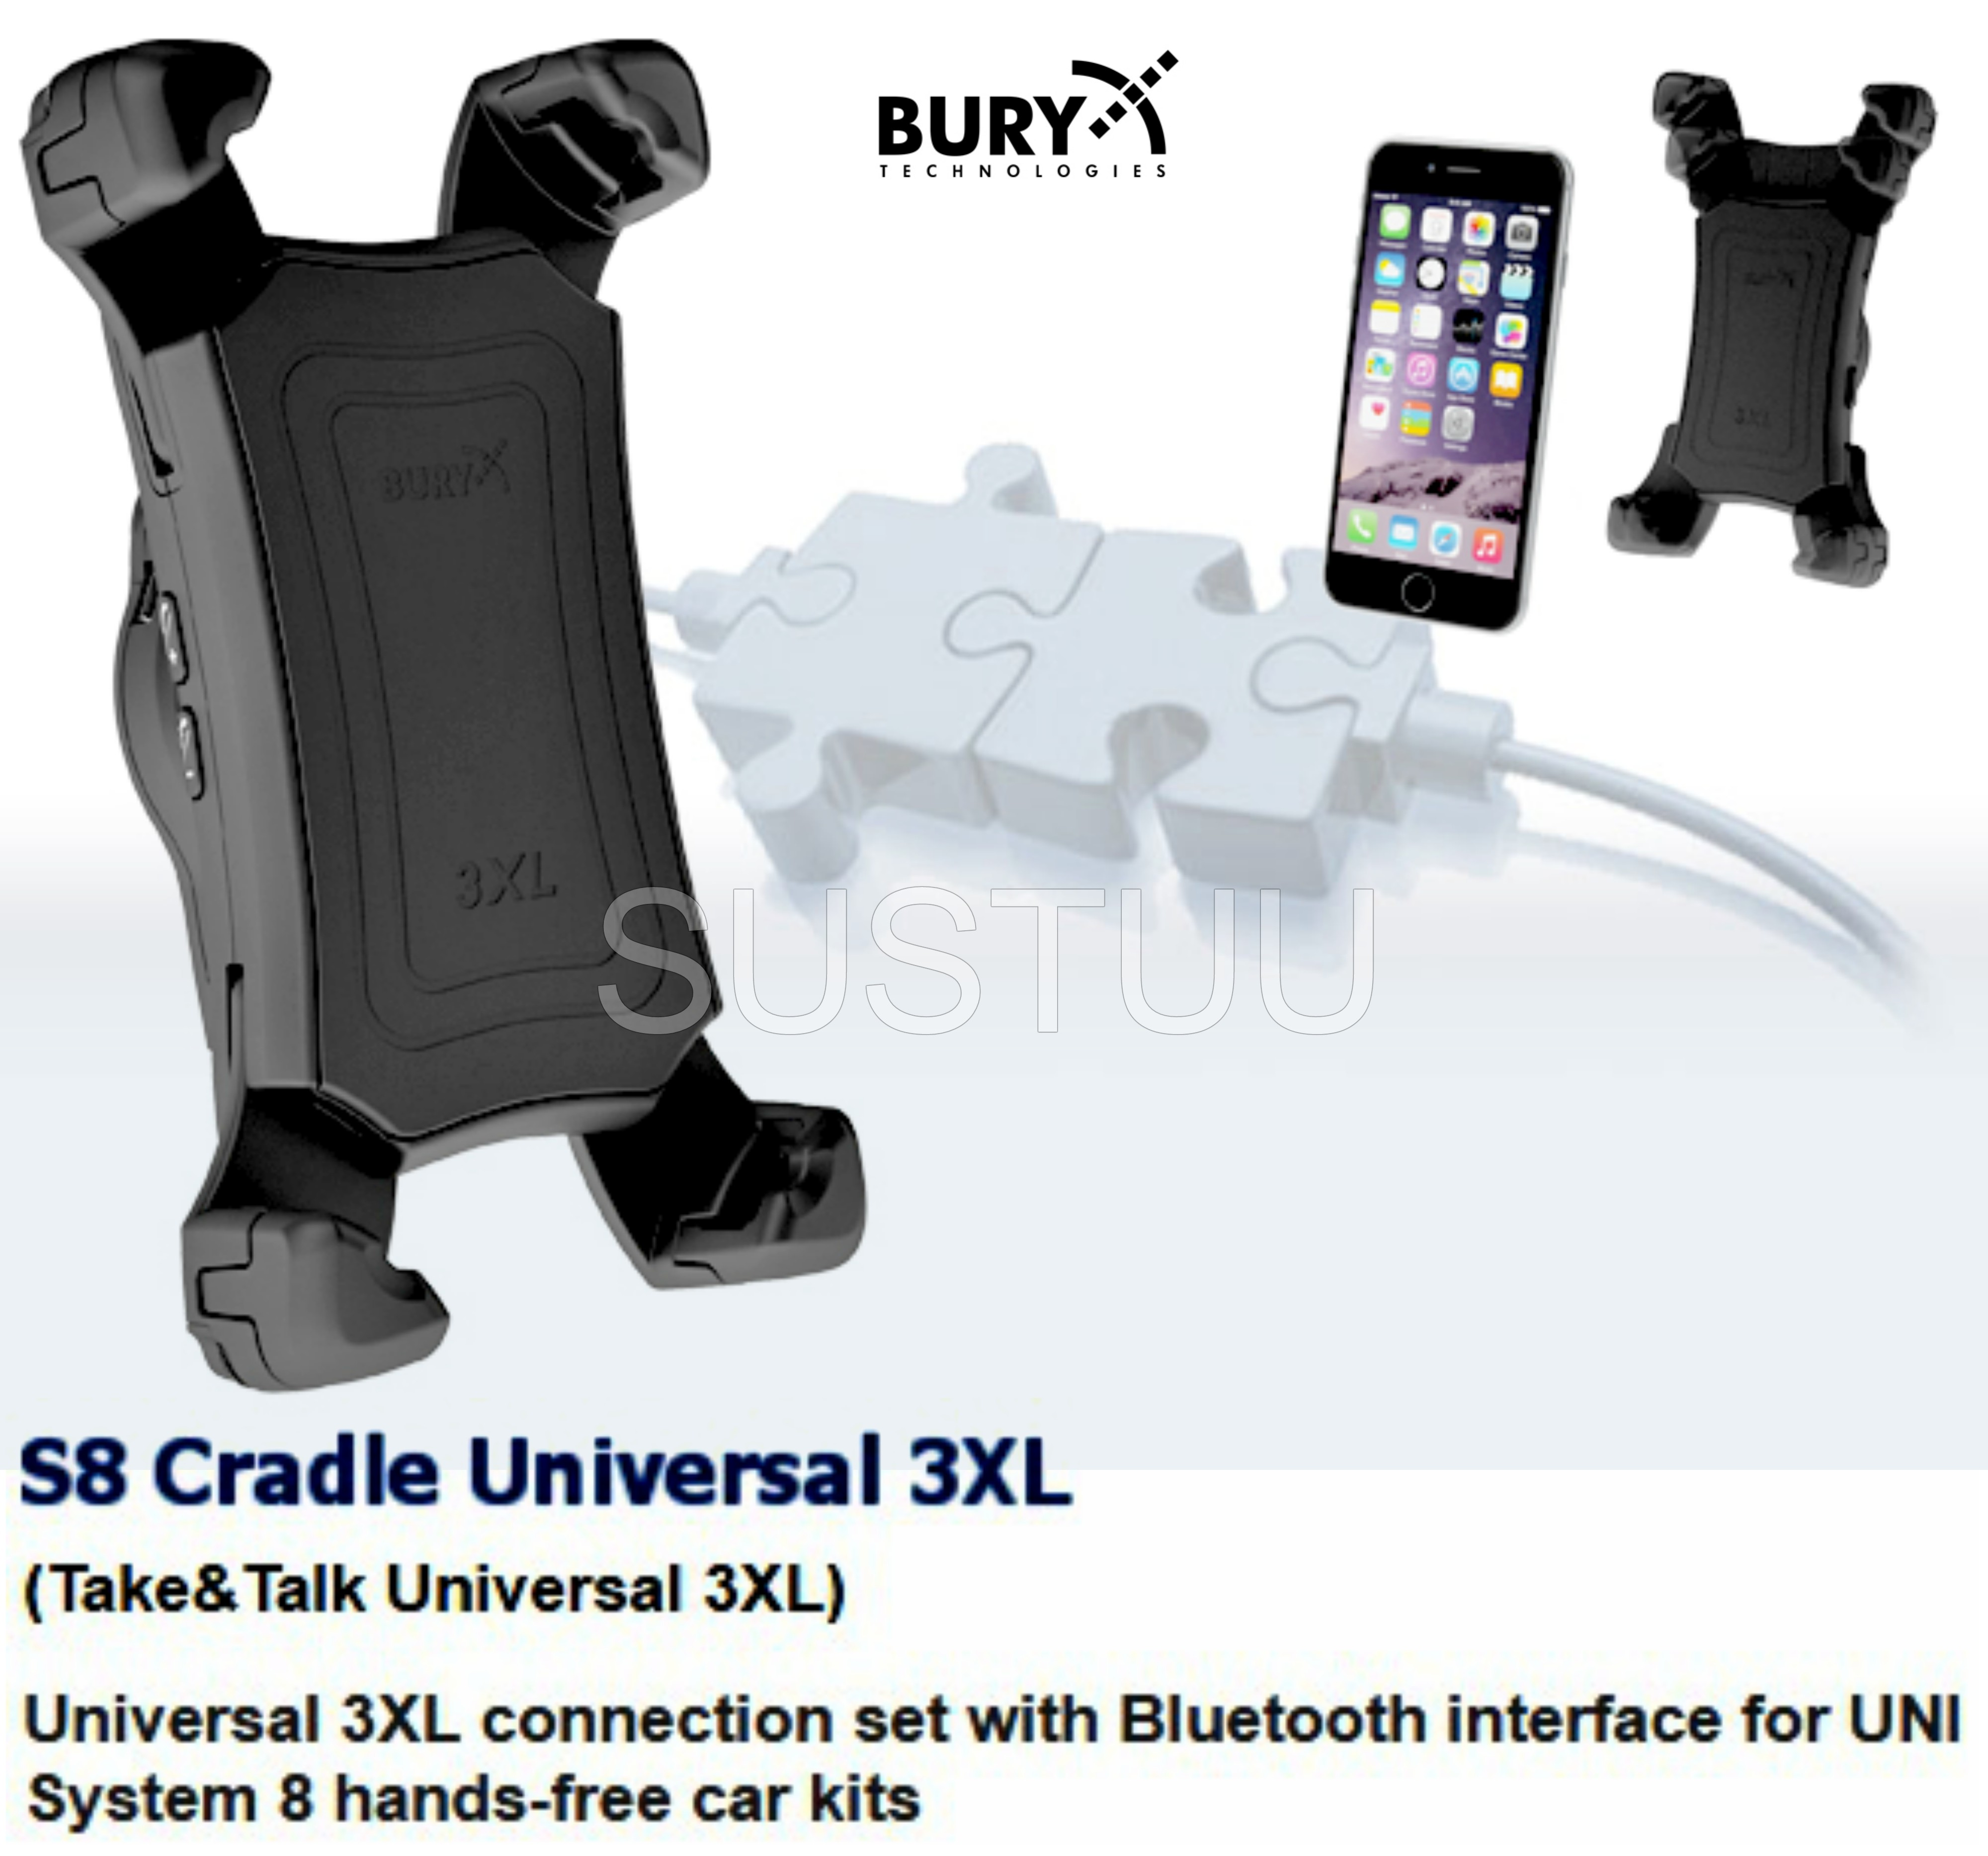 Bury Car Kit Wiring Diagram Bury Universal 3xl Swivel Mount with Bluetooth Interface & Hands Of Bury Car Kit Wiring Diagram